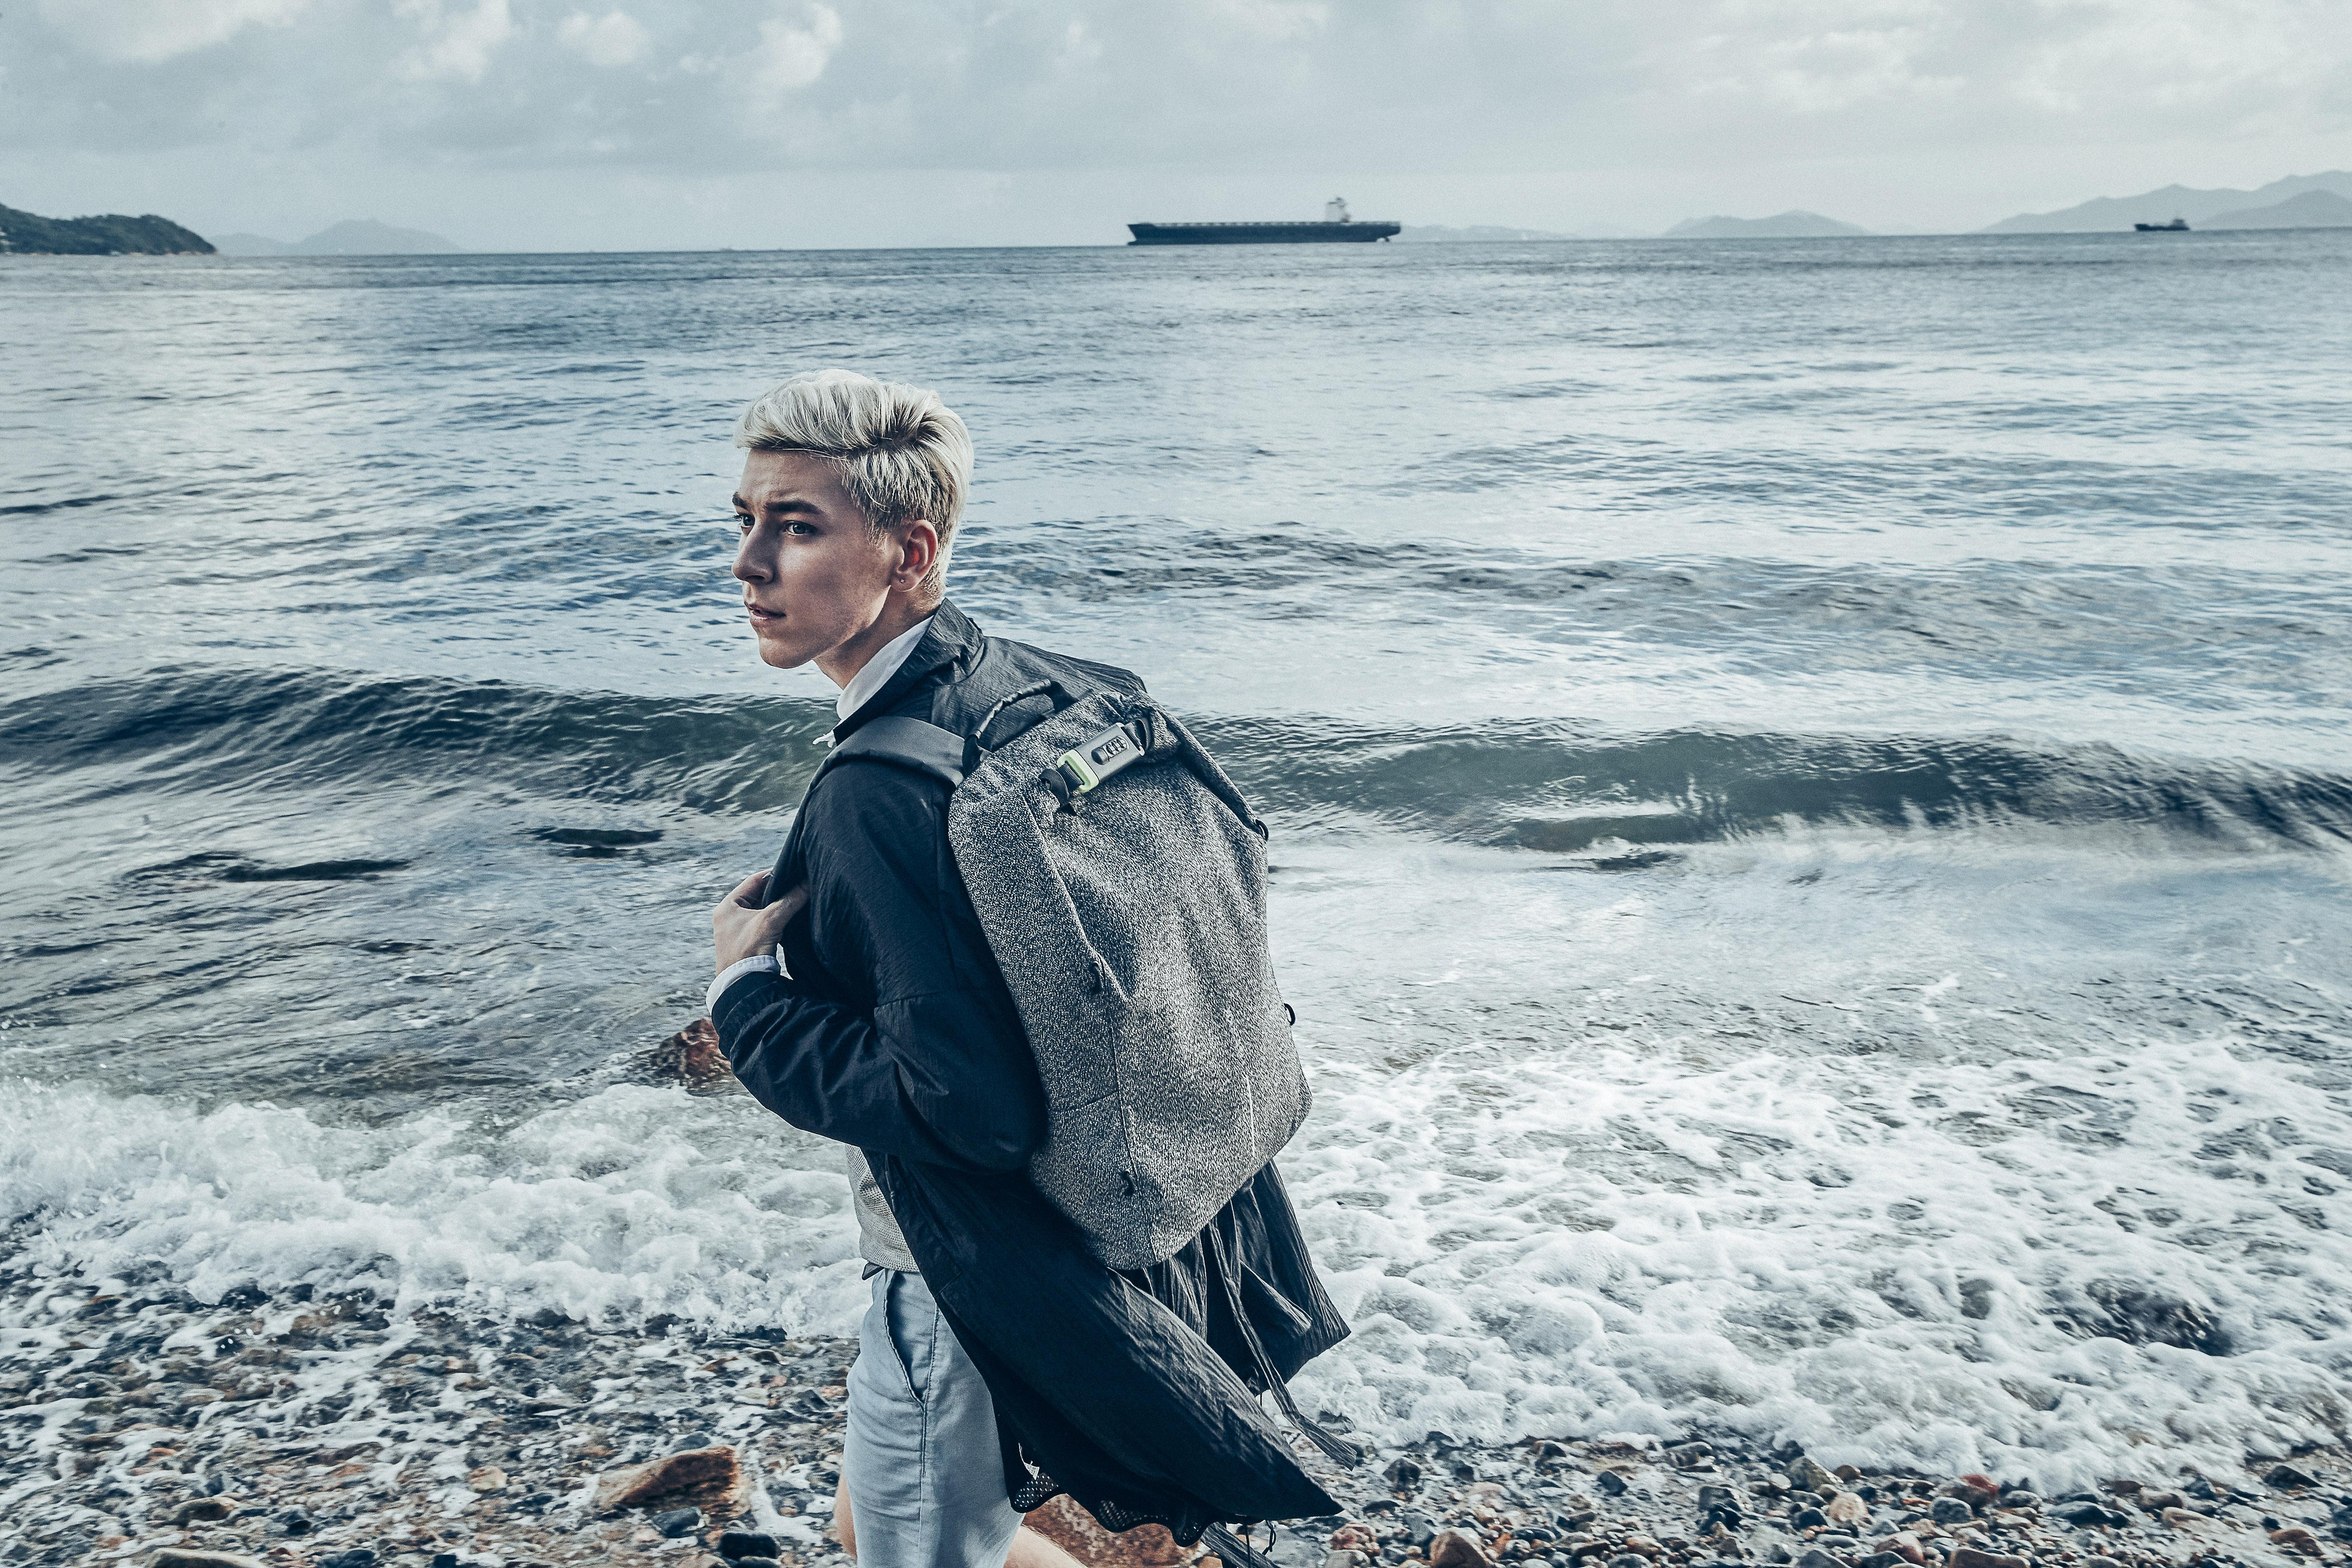 Ancheles #XDbackpack #fashionacessories